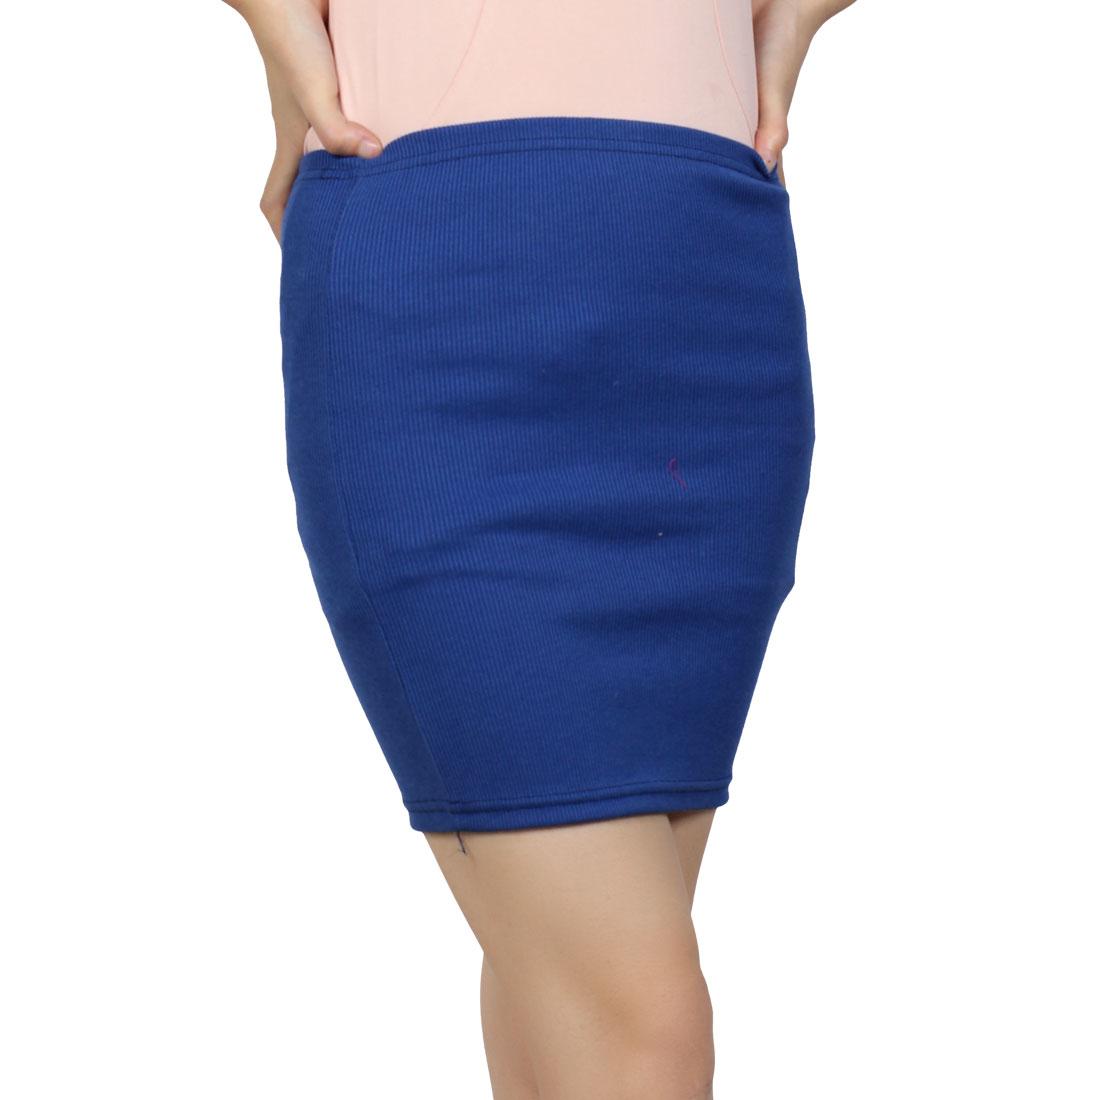 Women Indigo Blue Elastic Waist Textured Stylish Mini Skirt XS